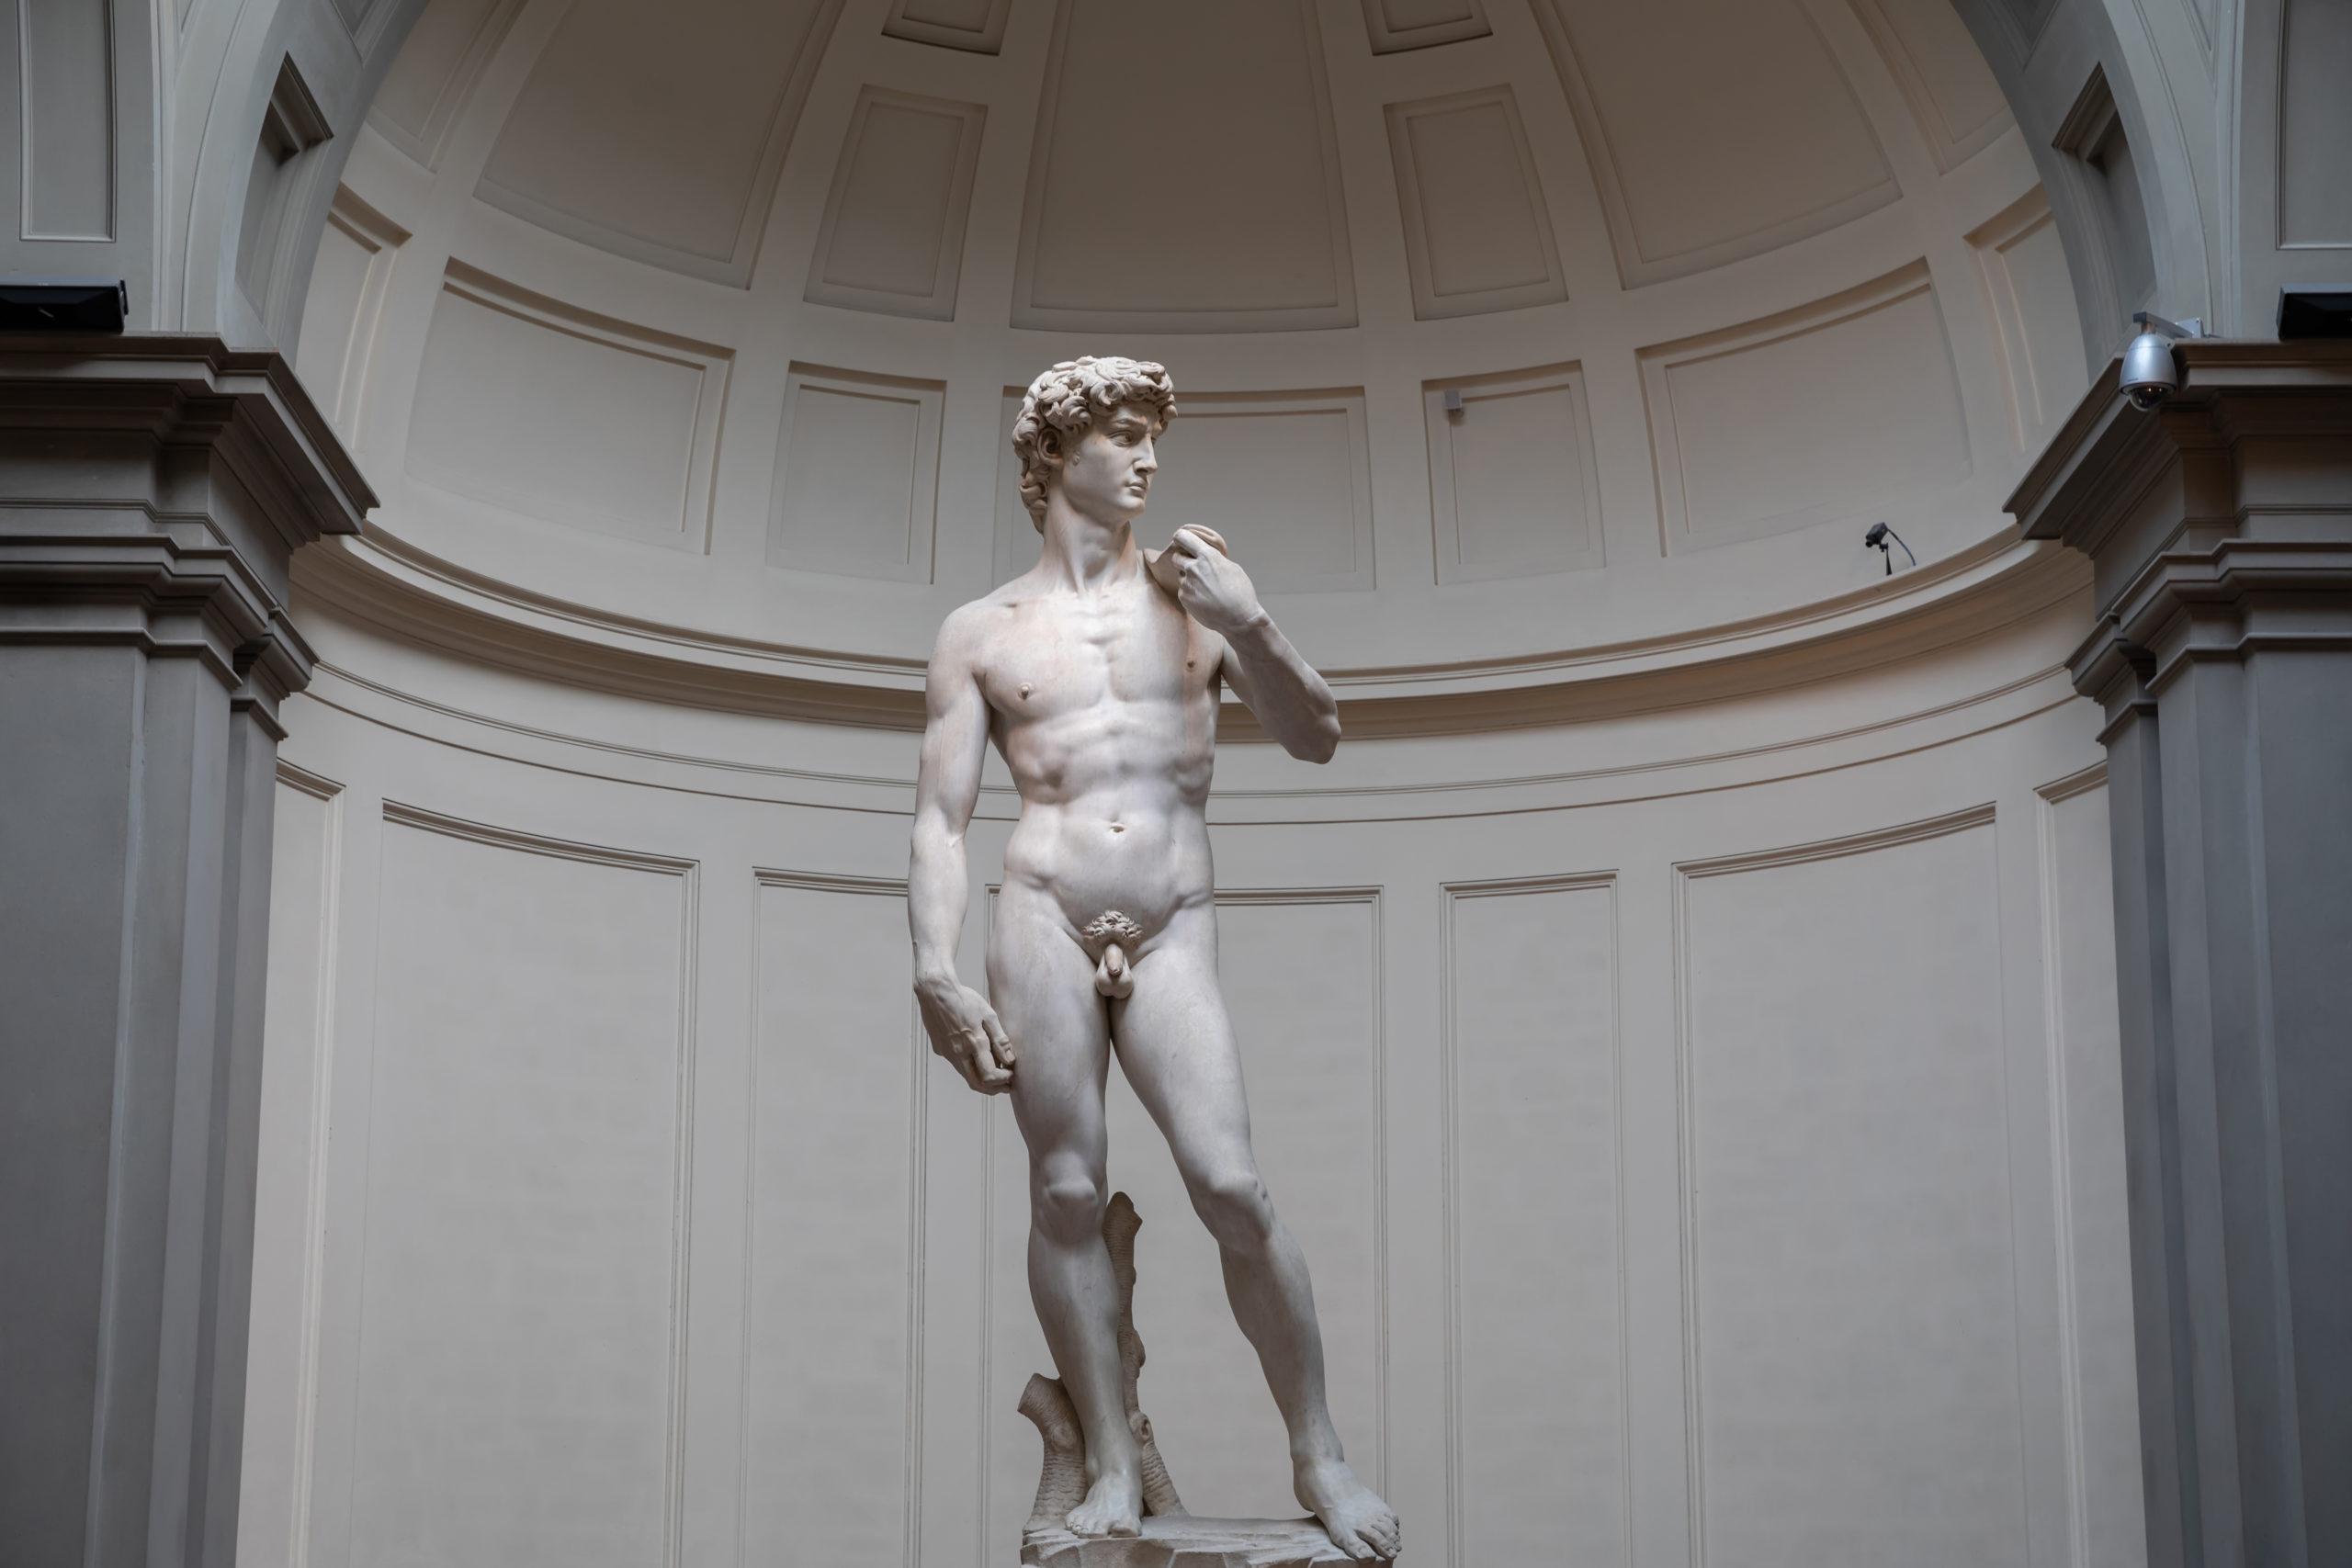 Closeup of Renaissance sculpture is David by Michelangelo